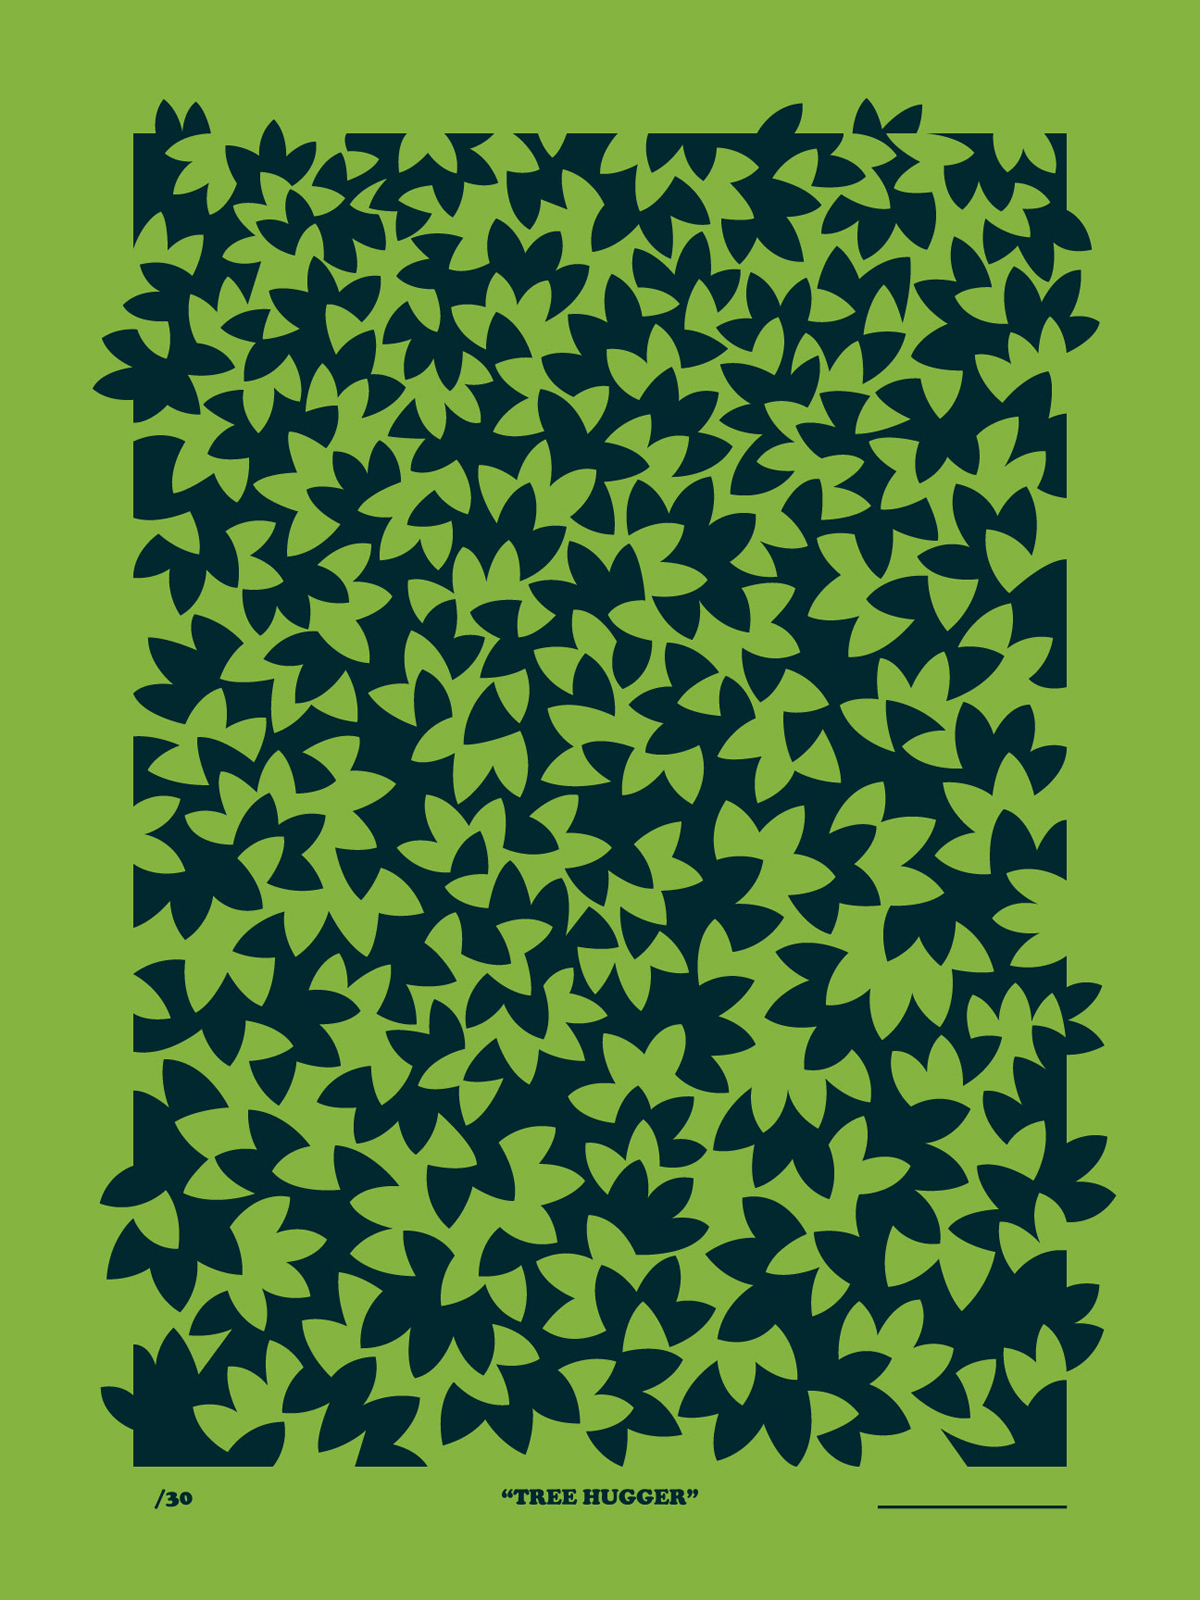 Tree Hugger poster by Austin Nash